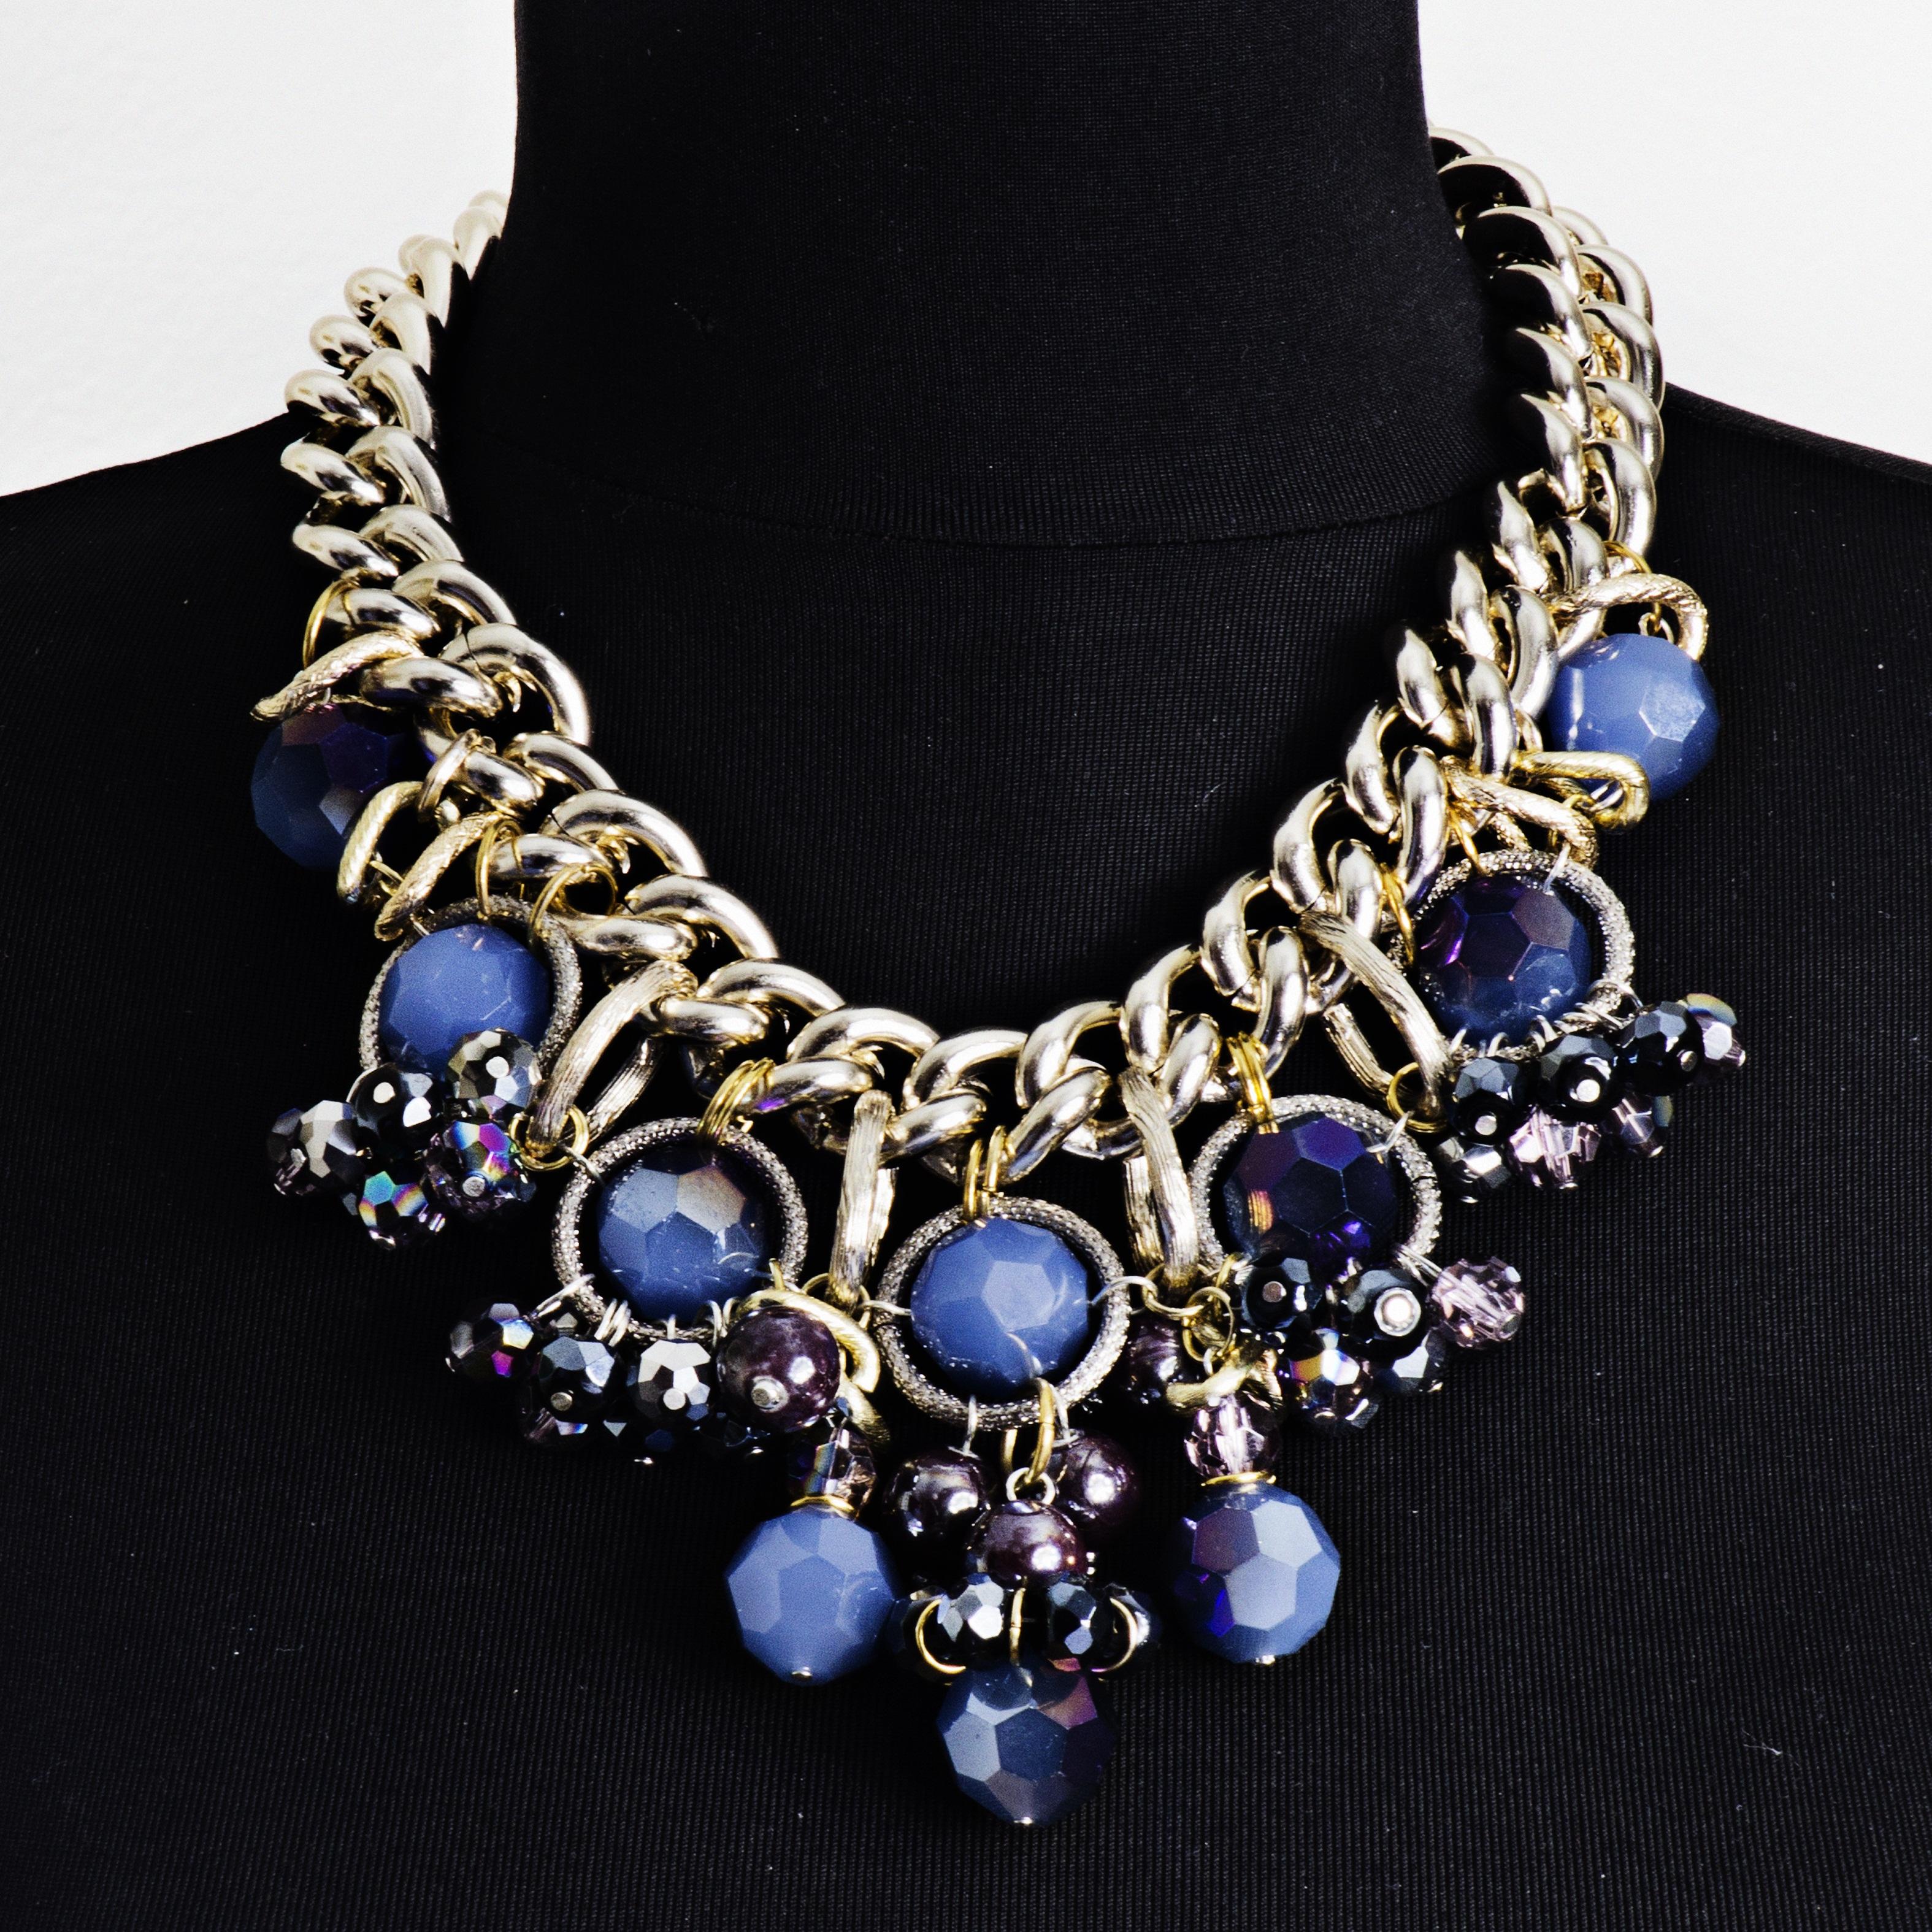 ogrlica harmony 10 Aksesoar dana: Ogrlica HelenaDia iz kolekcije Harmony